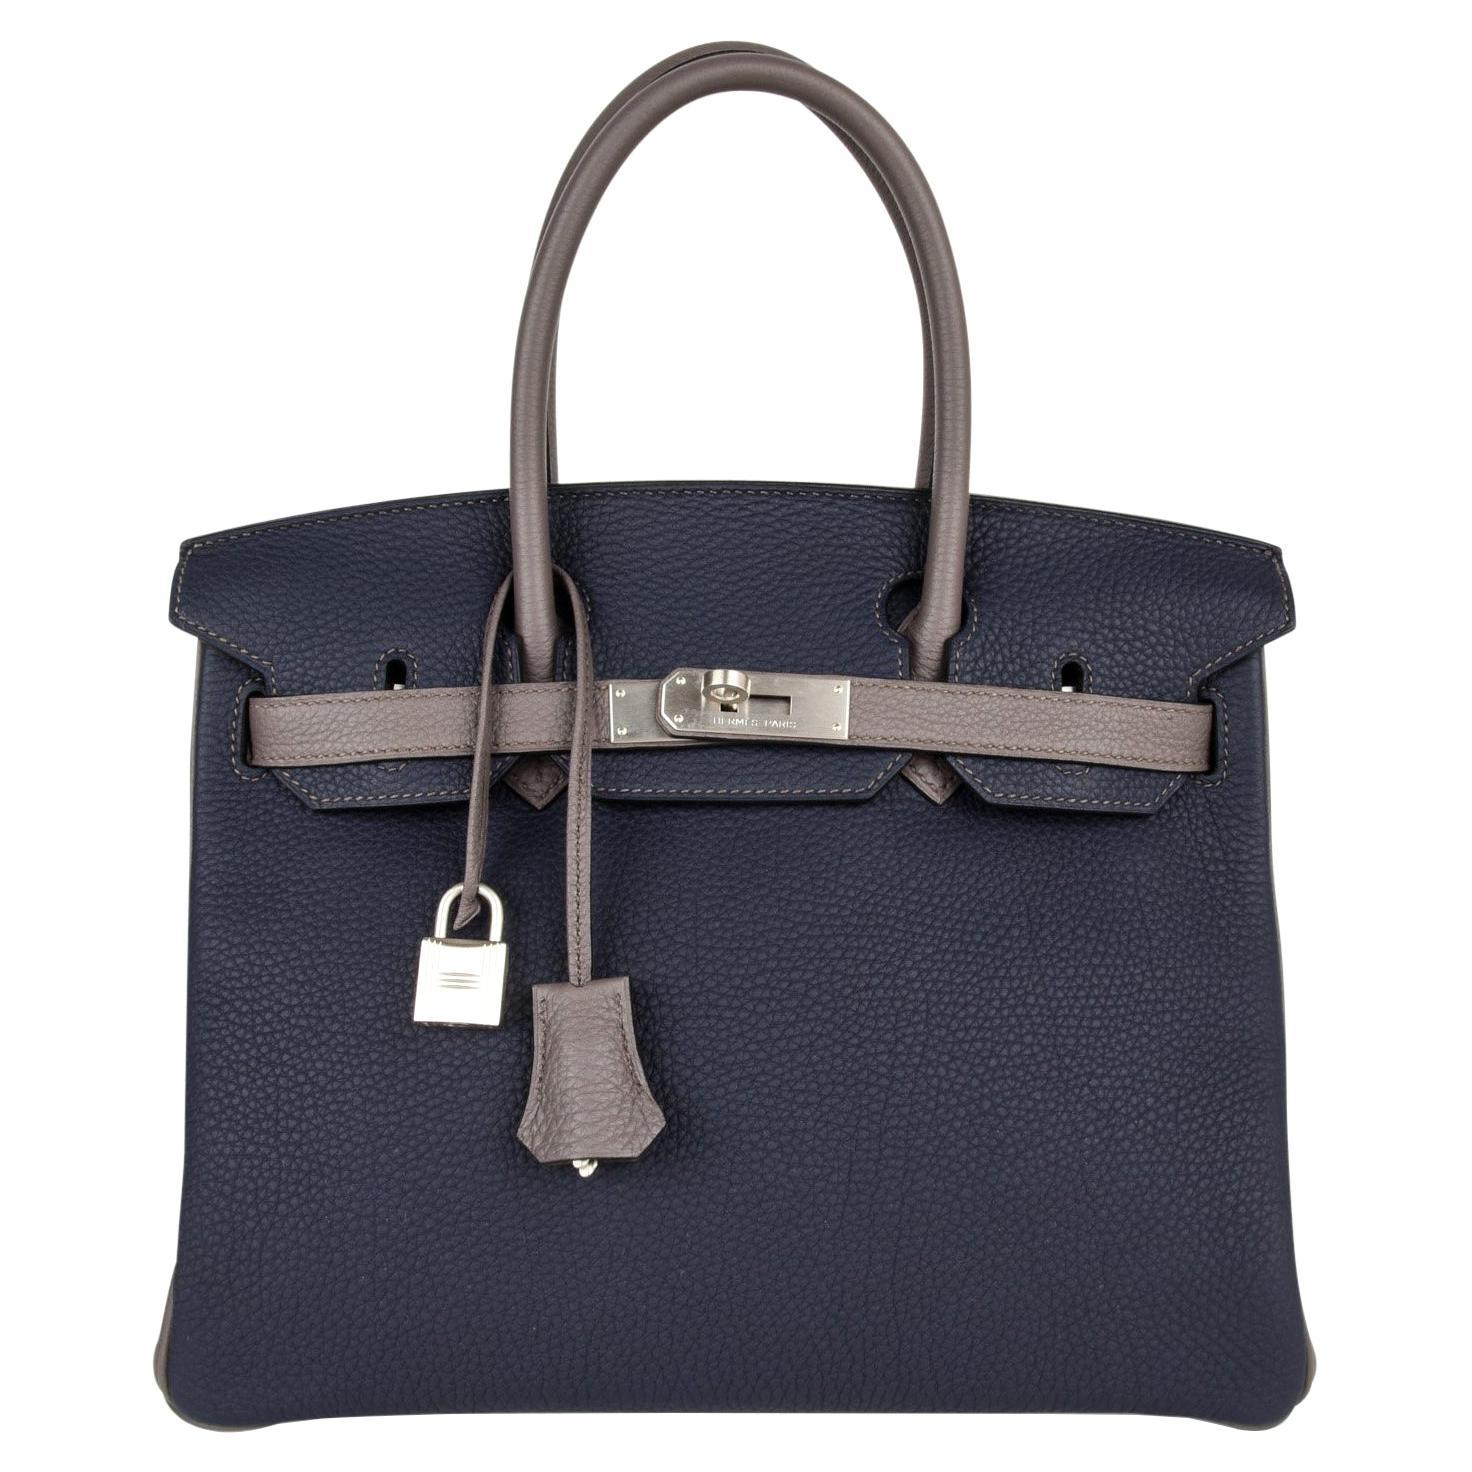 Hermes Birkin HSS 30 Bag Blue Nuit / Etain Togo Brushed Palladium